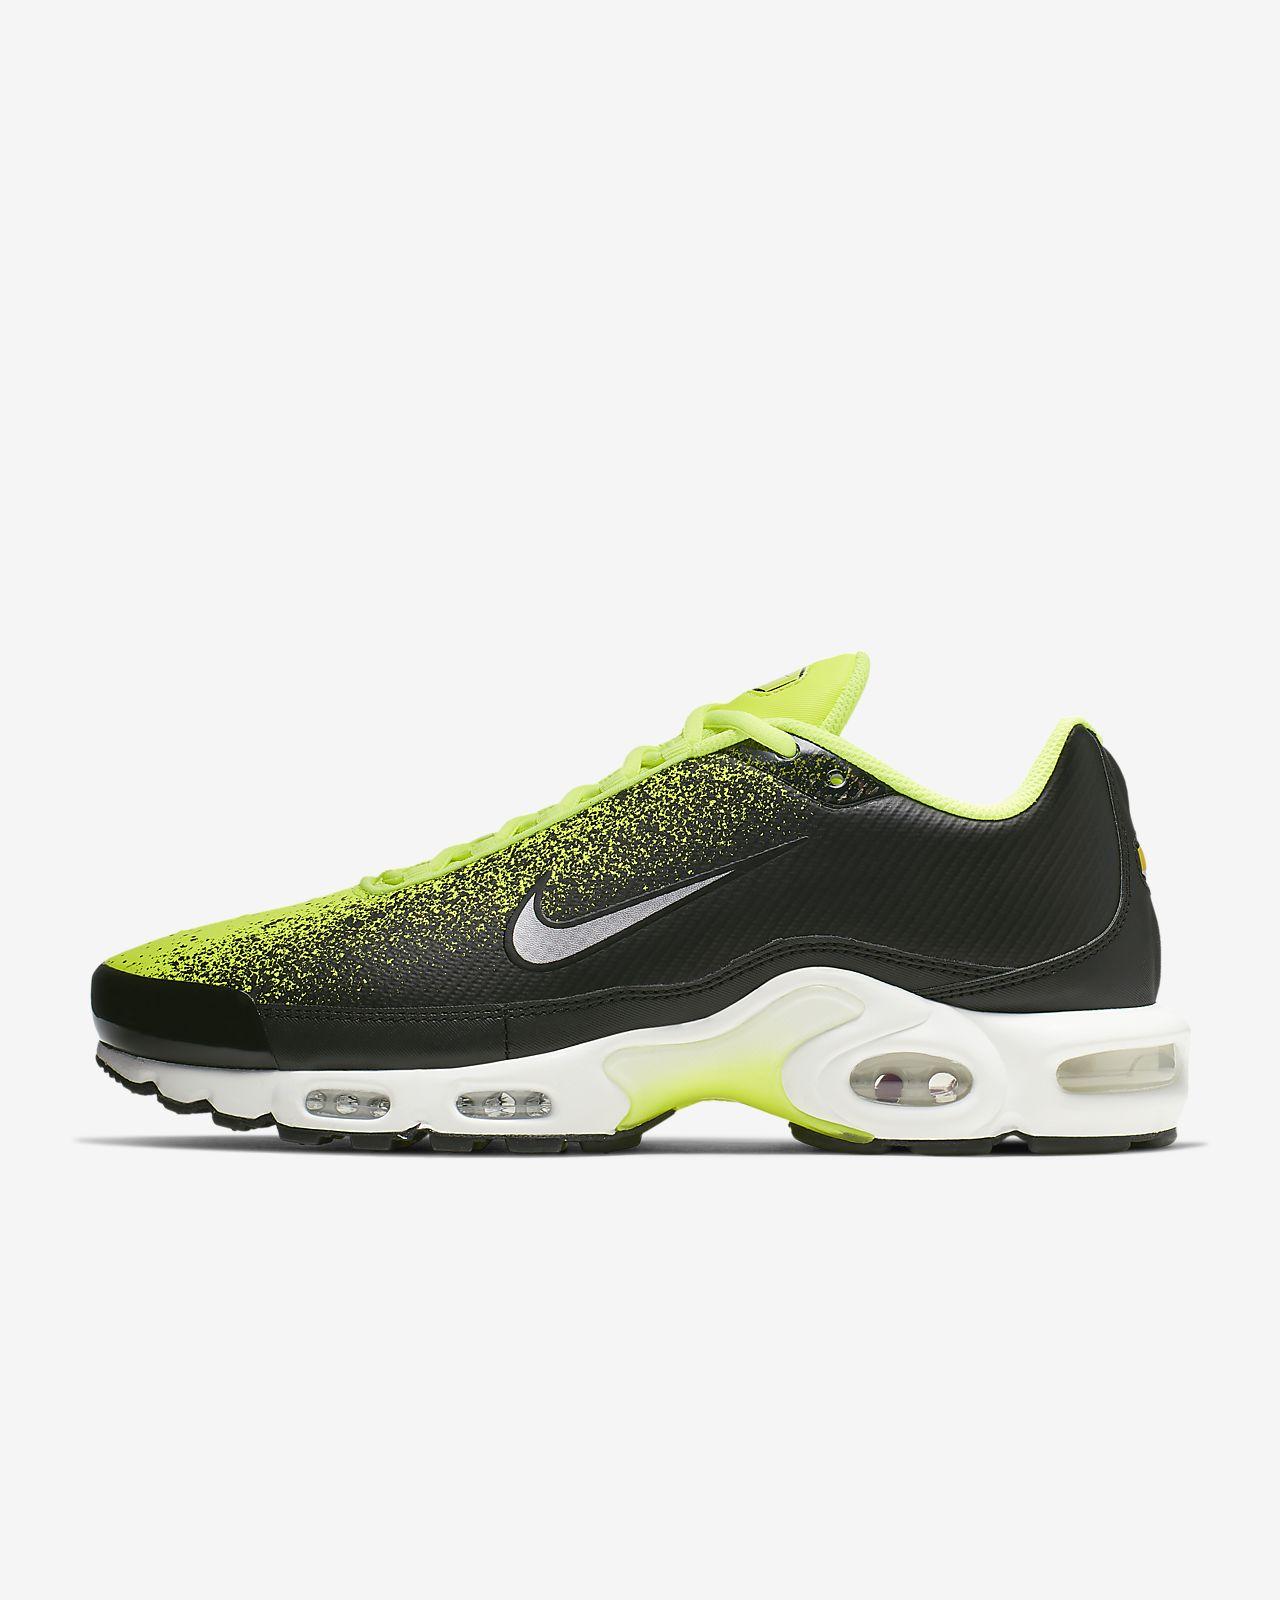 Nike Air Max Plus Tn SE Herenschoen